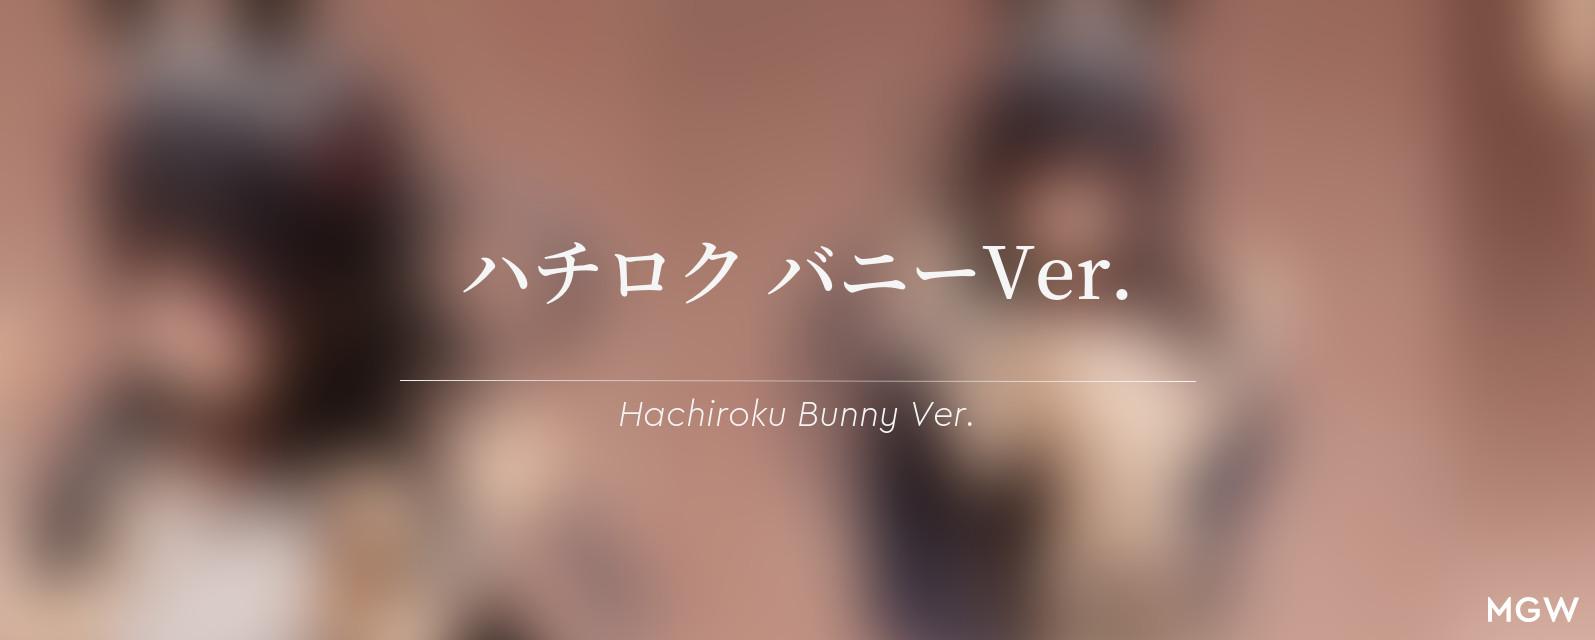 Hachiroku Bunny Ver. by BINDing from Maitetsu